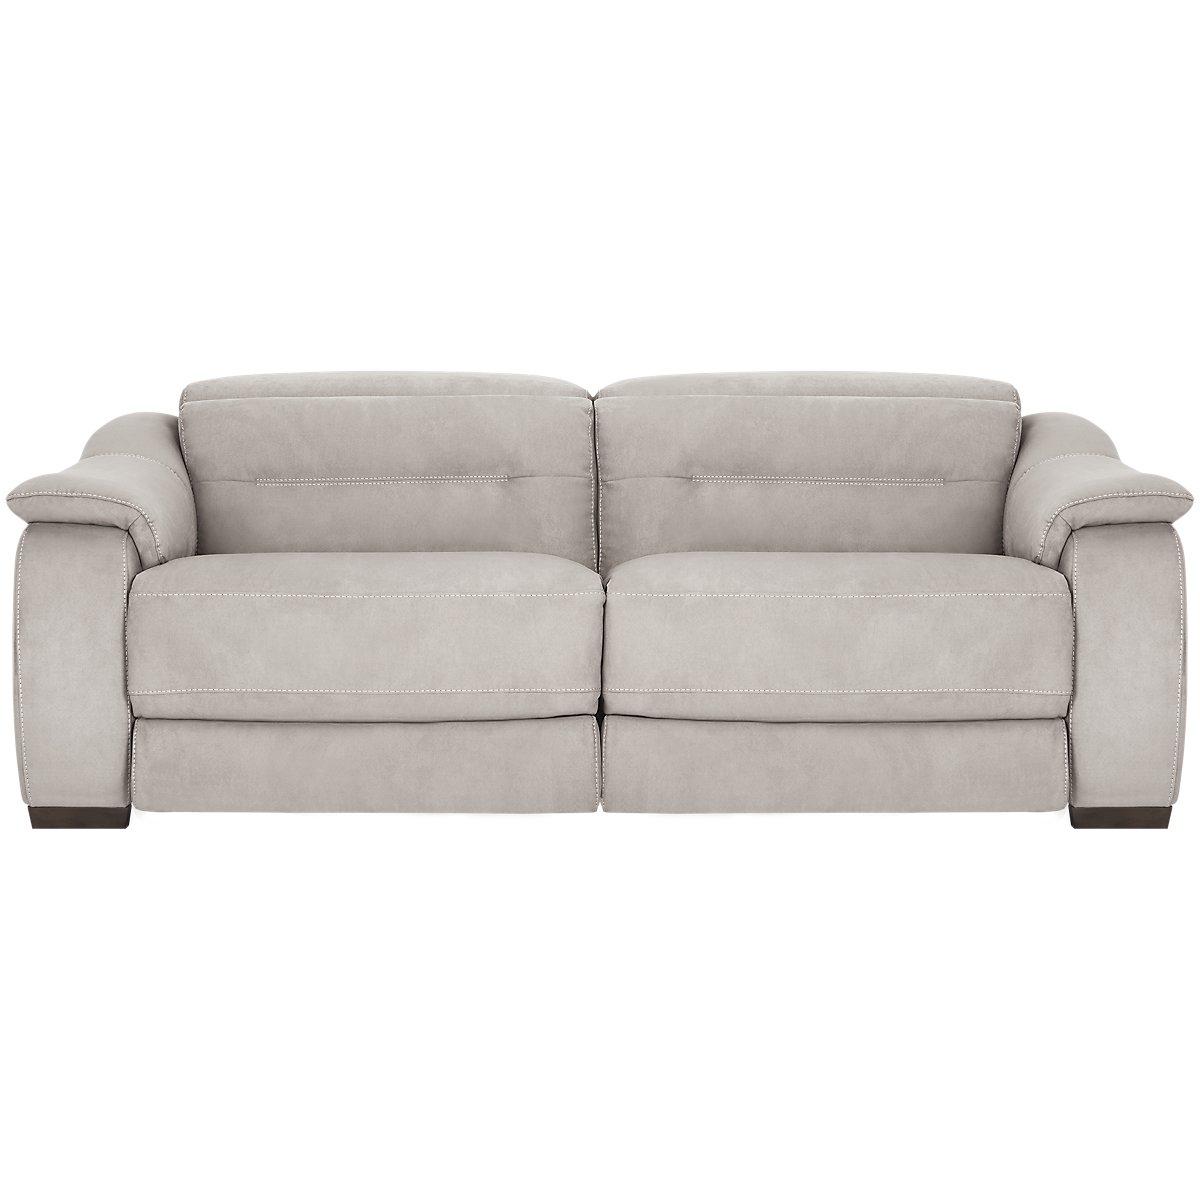 Grey Microfiber Sofa Sensations Gray Microfiber Sofa